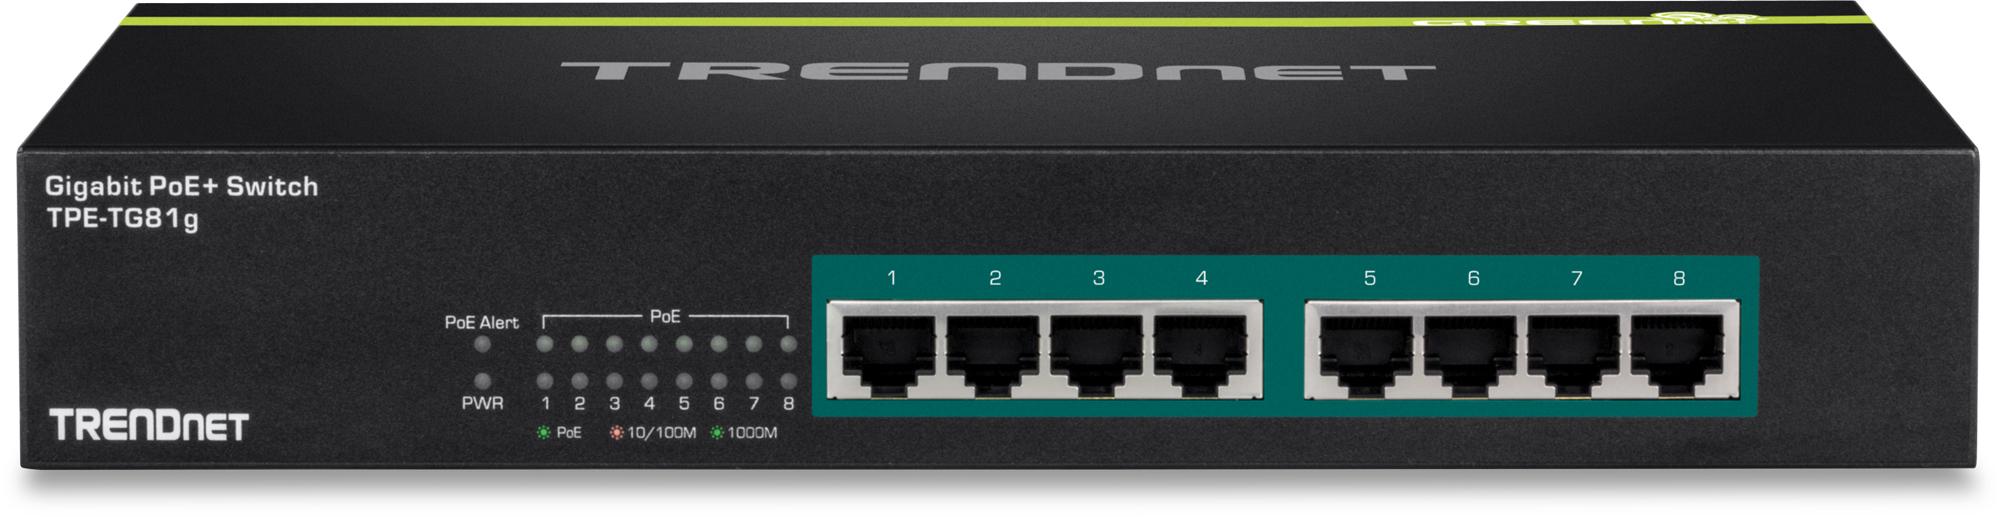 Trendnet TPE-TG81g No administrado Gigabit Ethernet (10/100/1000) Negro Energía sobre Ethernet (PoE)